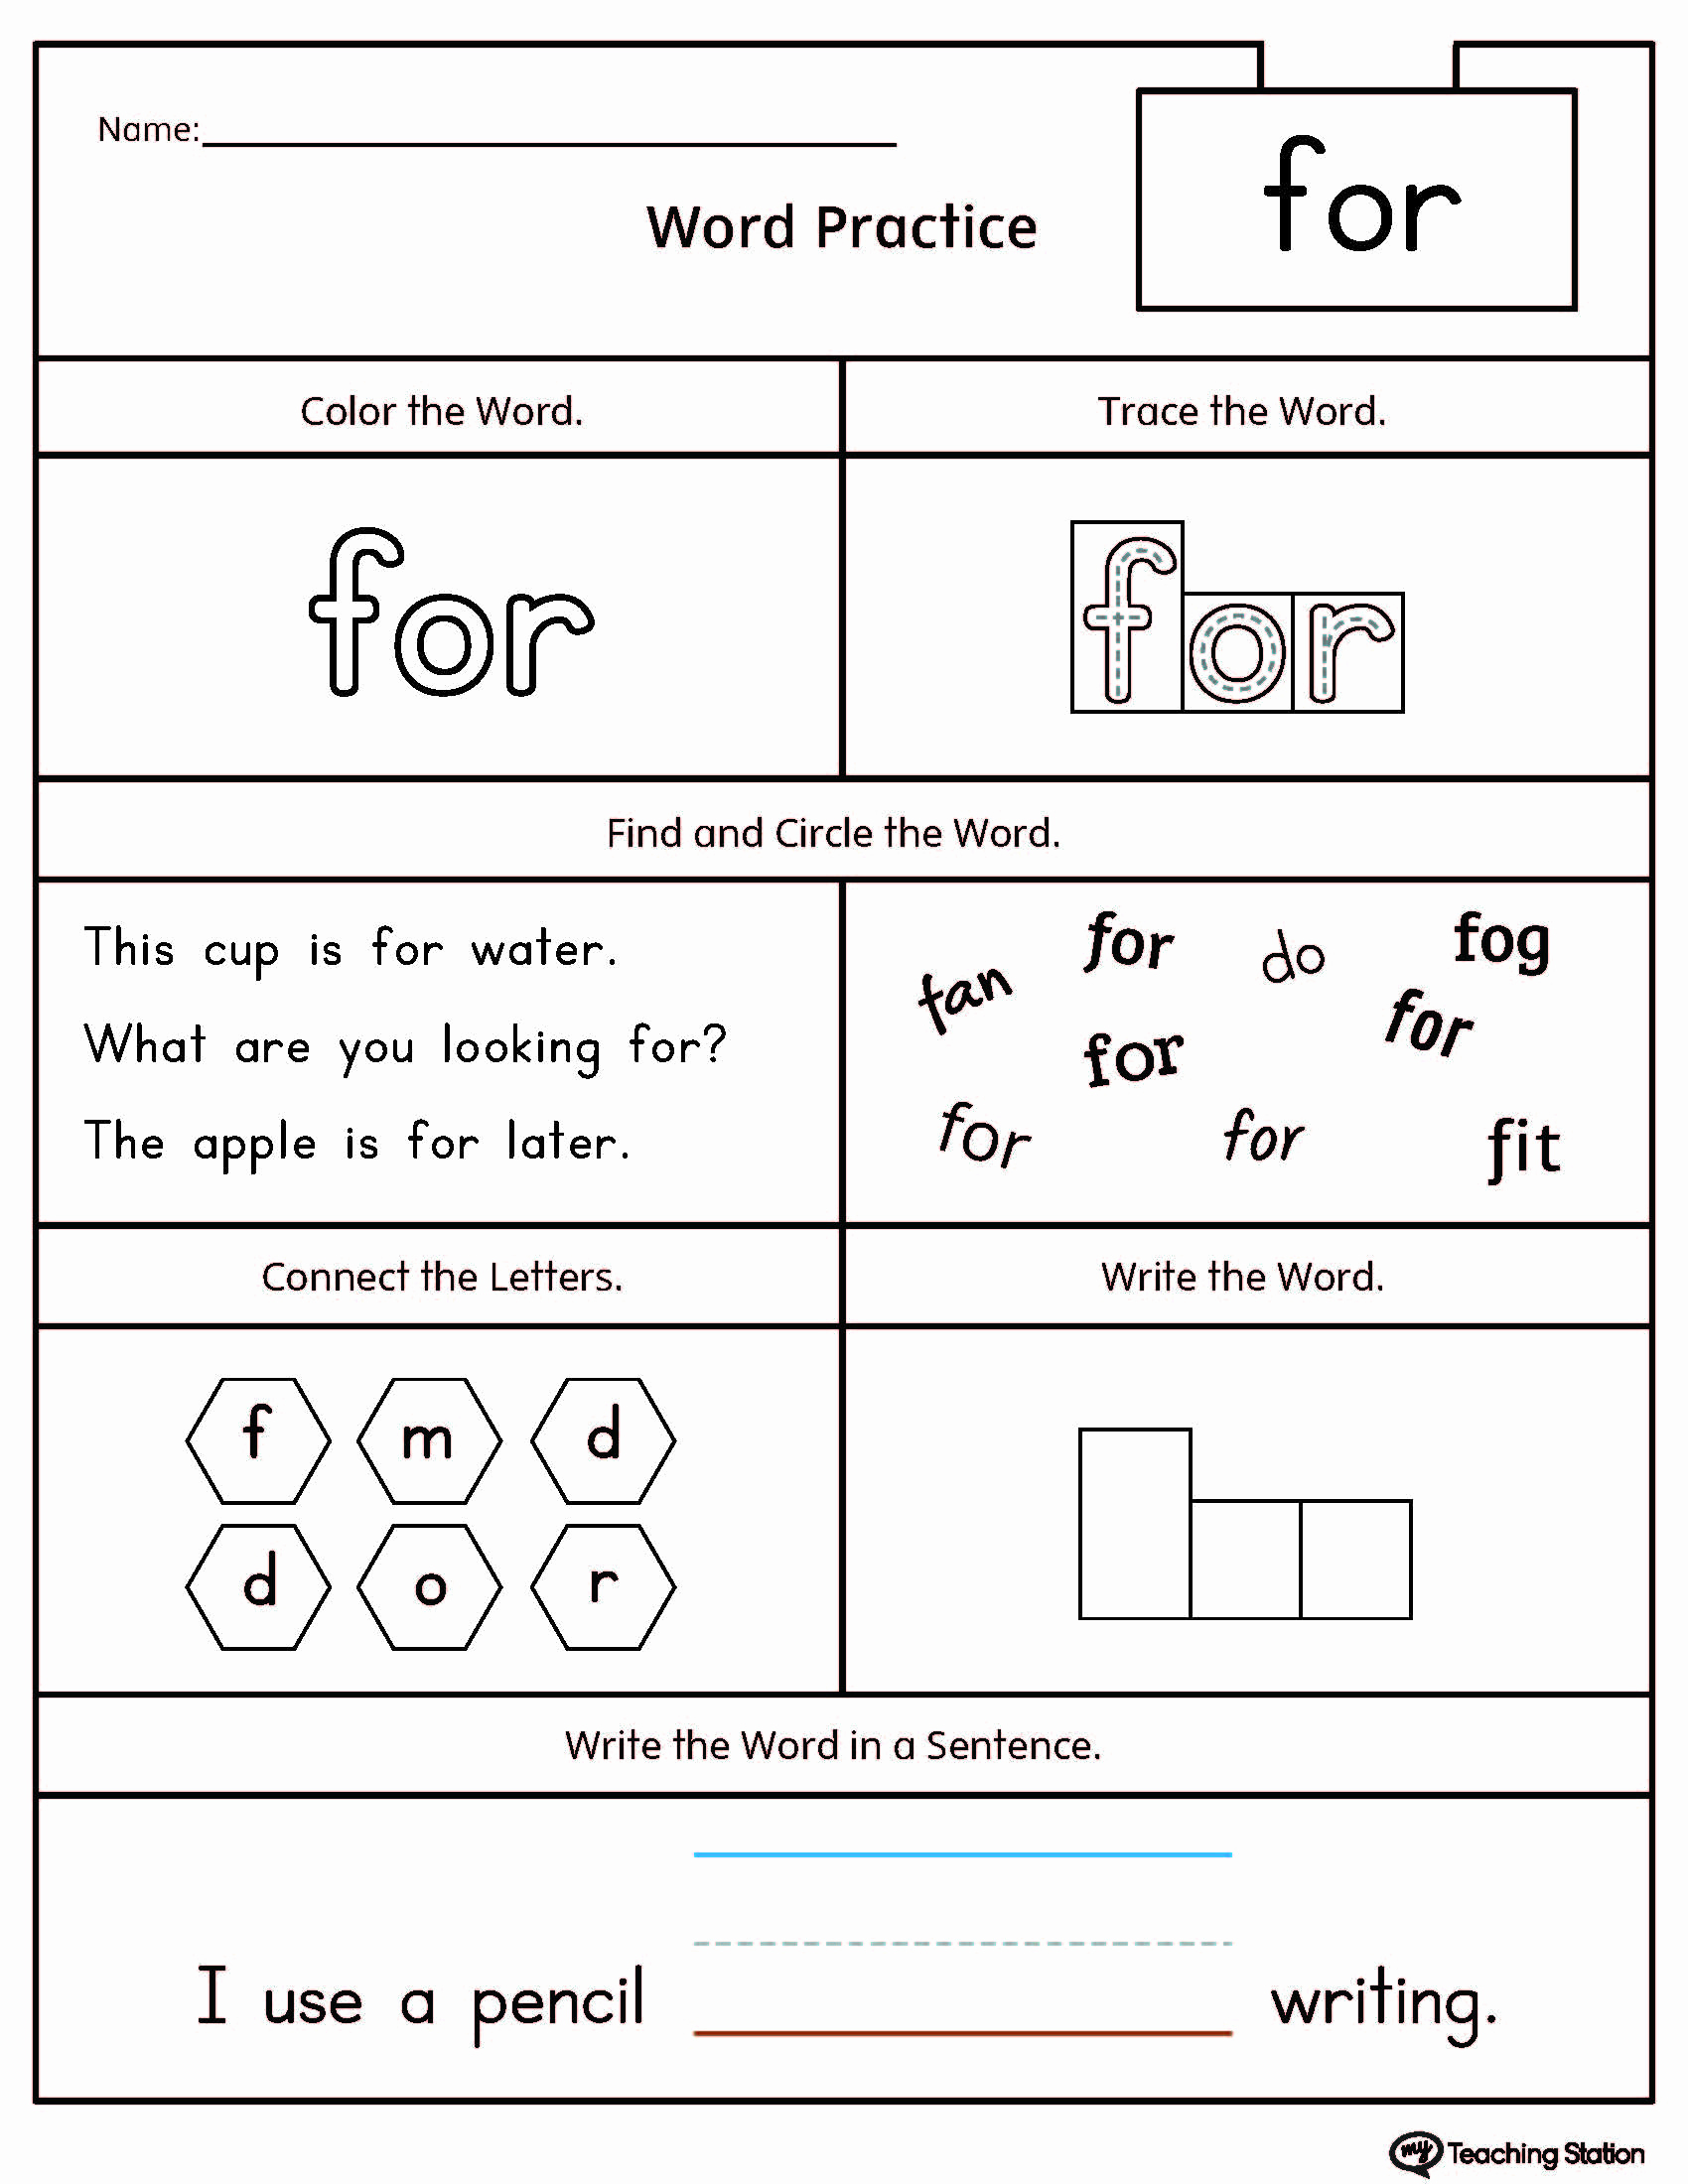 Positional Words Worksheets for Preschool Awesome 20 Positional Words Preschool Worksheets